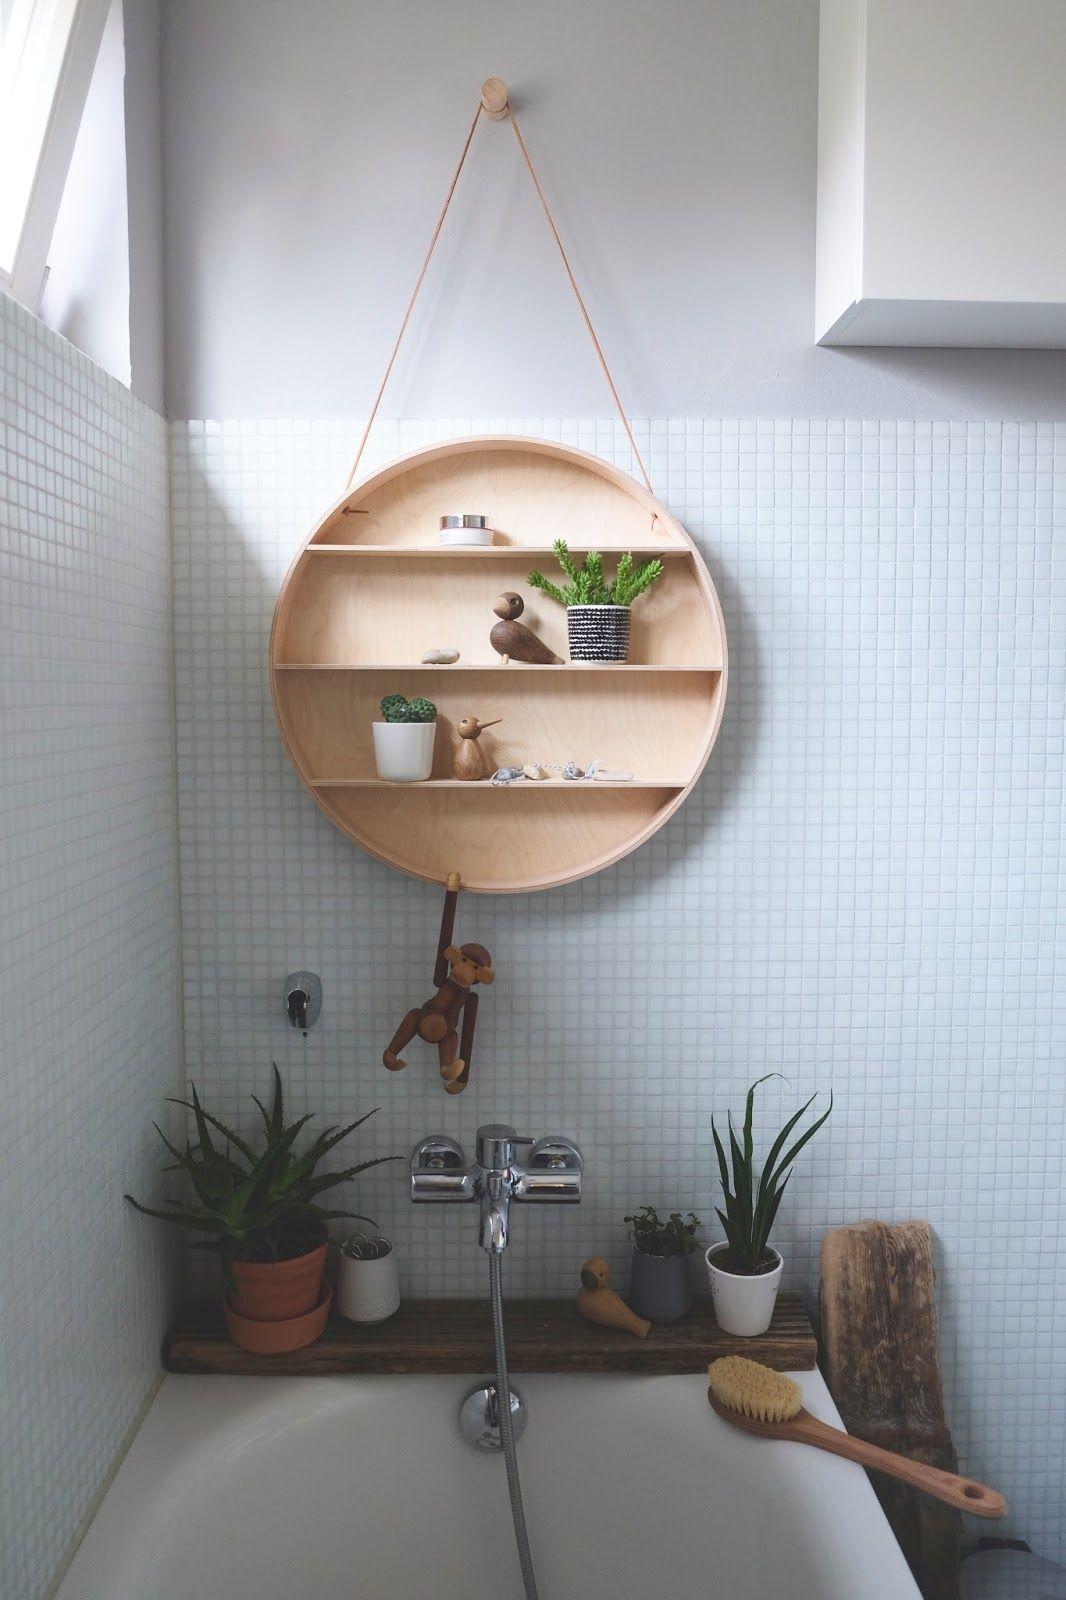 Badregal ideen über toilette hej hanse urban jungle bloggers wilde tiere  interior inspiration